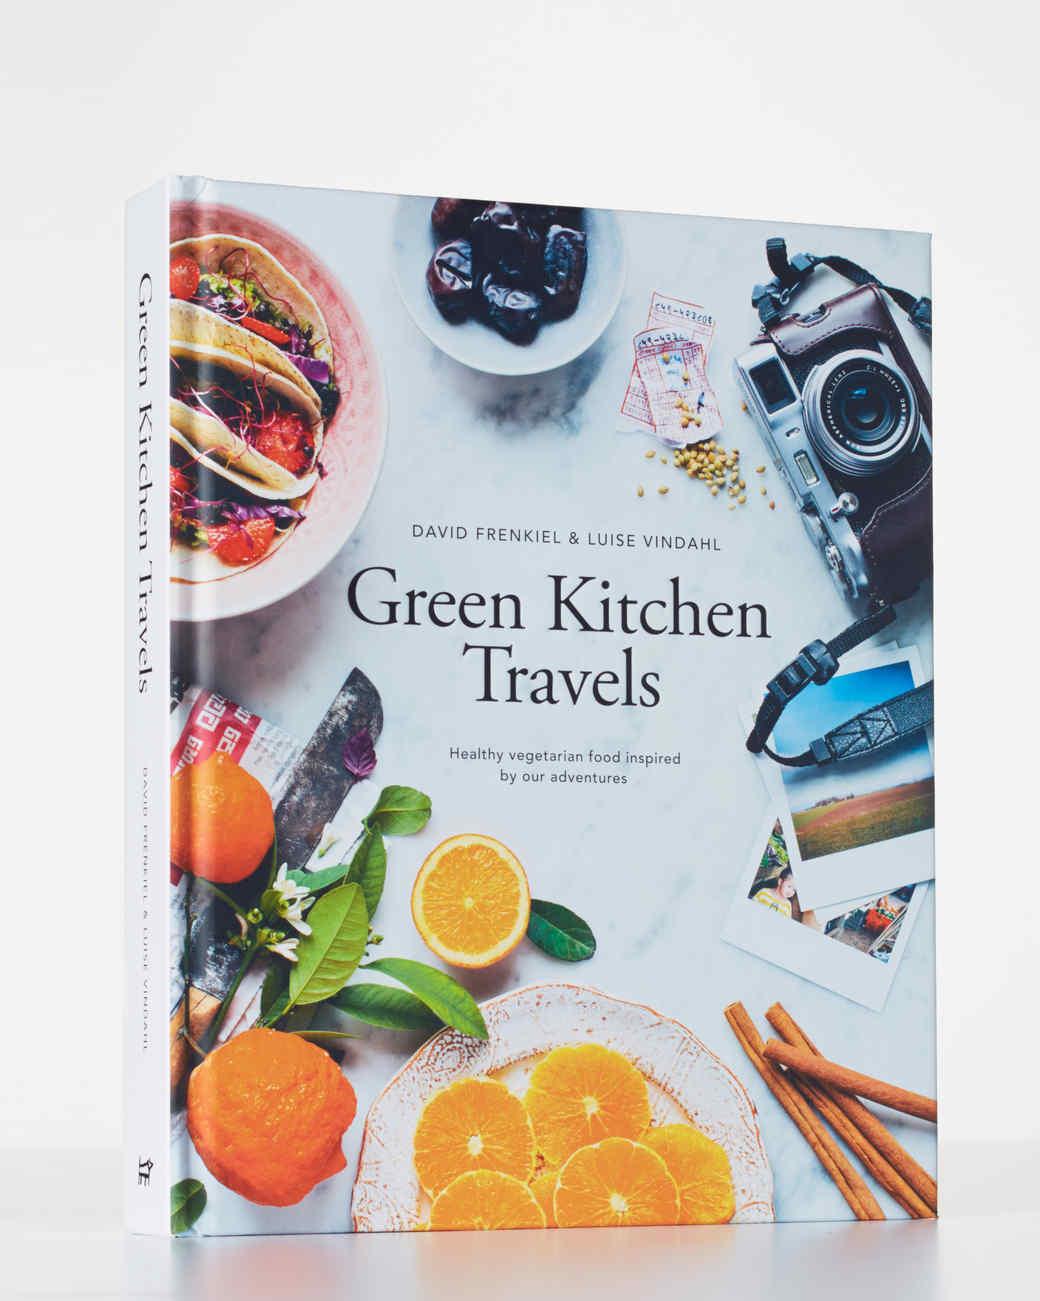 green-kitchen-travels-book-174-d111565-1214.jpg